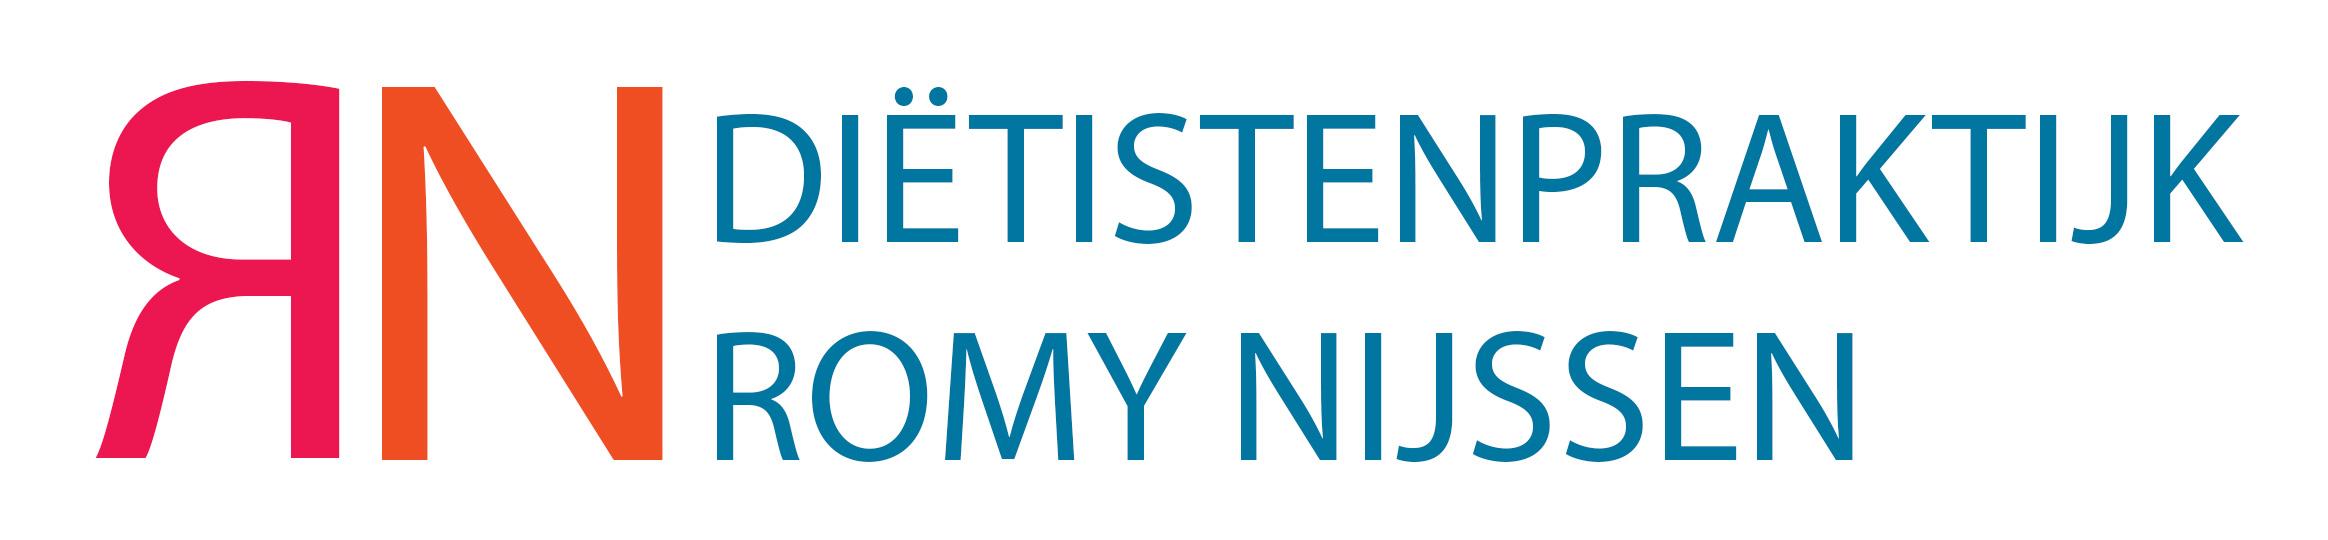 Diëtistenpraktijk Romy Nijssen